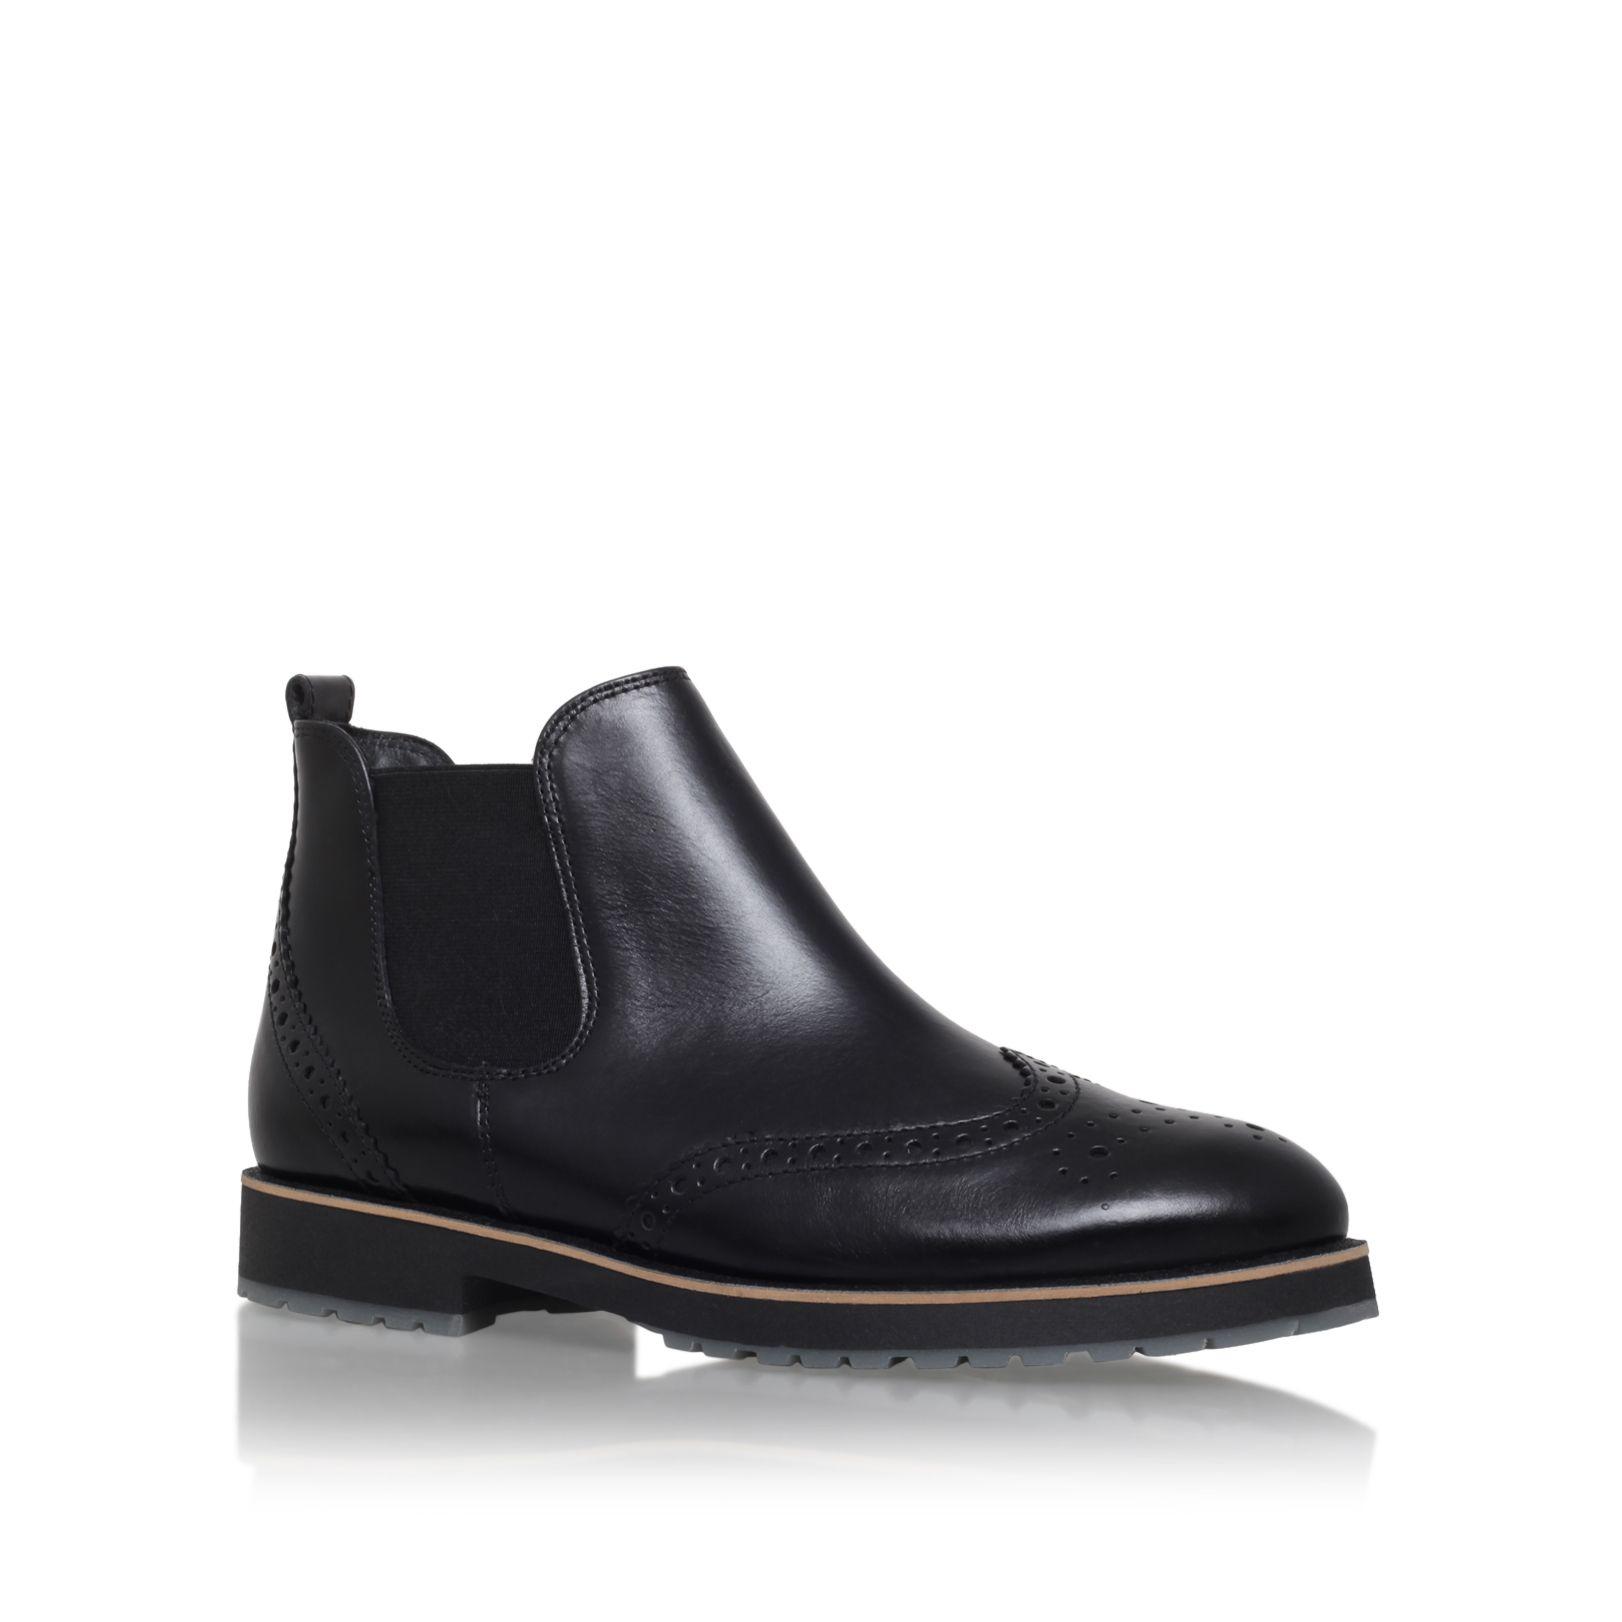 paul green chelsea fl bt low heel ankle boots in black for men lyst. Black Bedroom Furniture Sets. Home Design Ideas